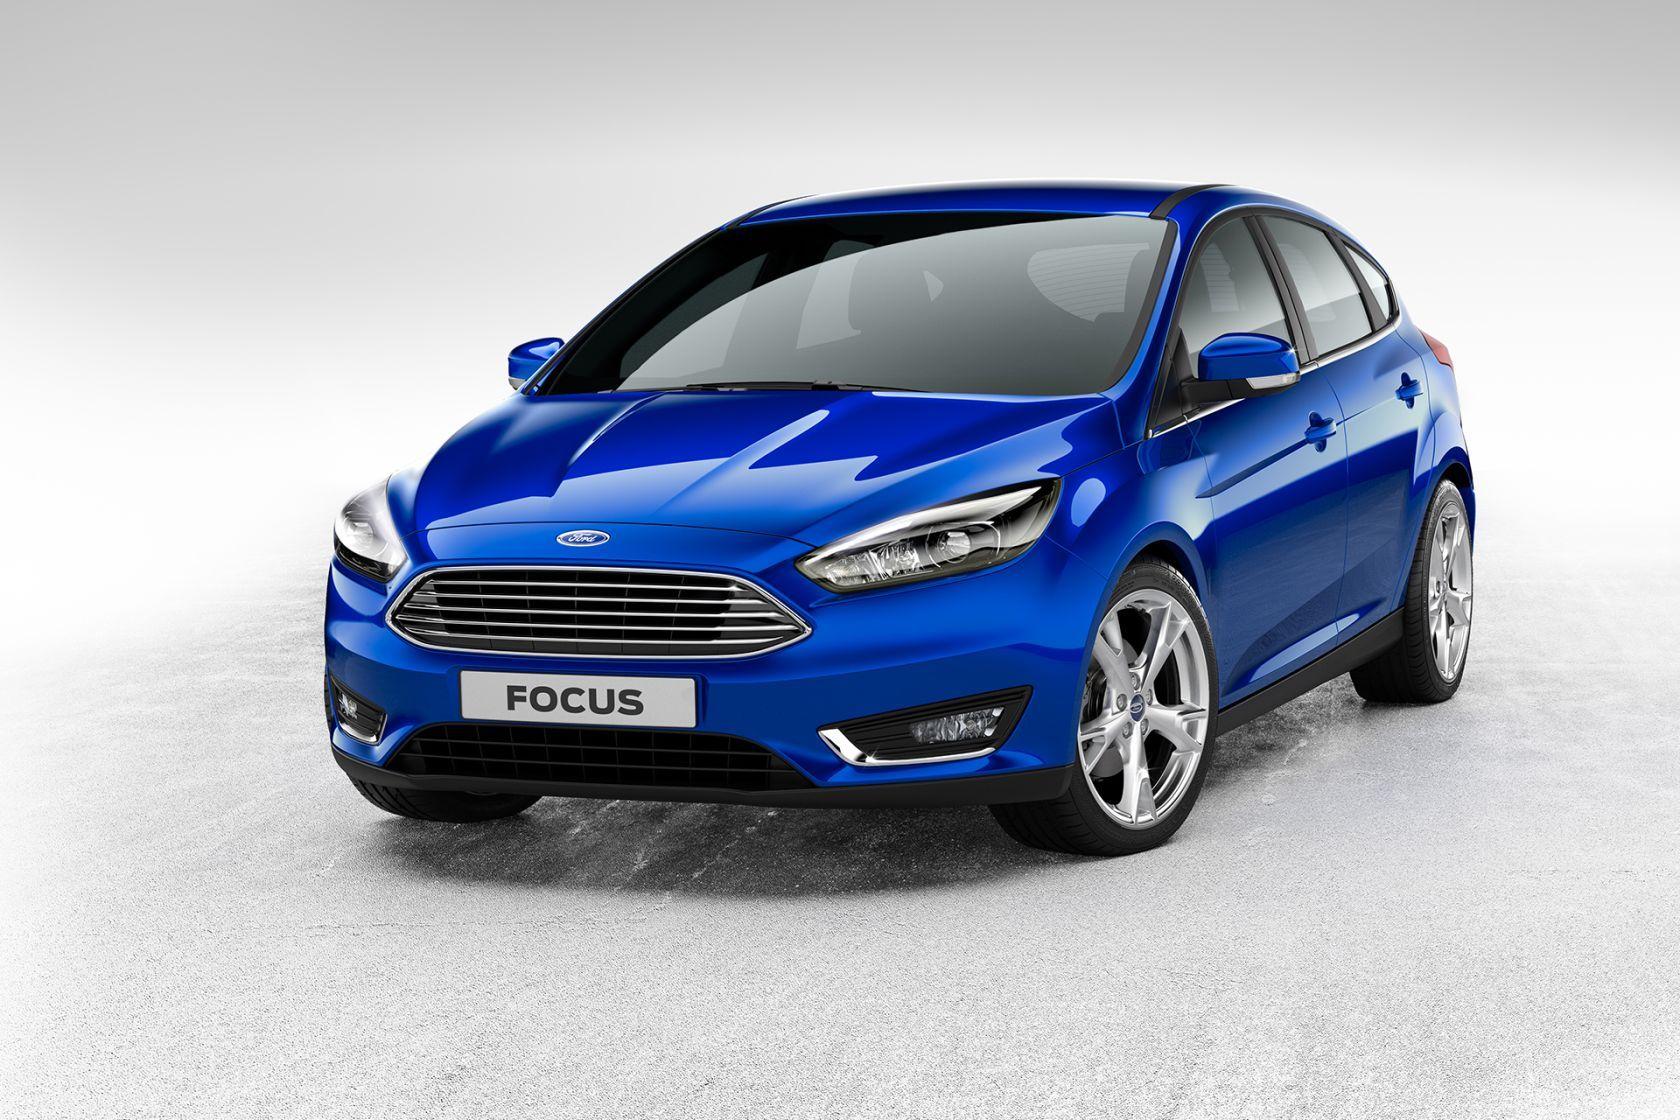 Focus-hatchback-2015-04